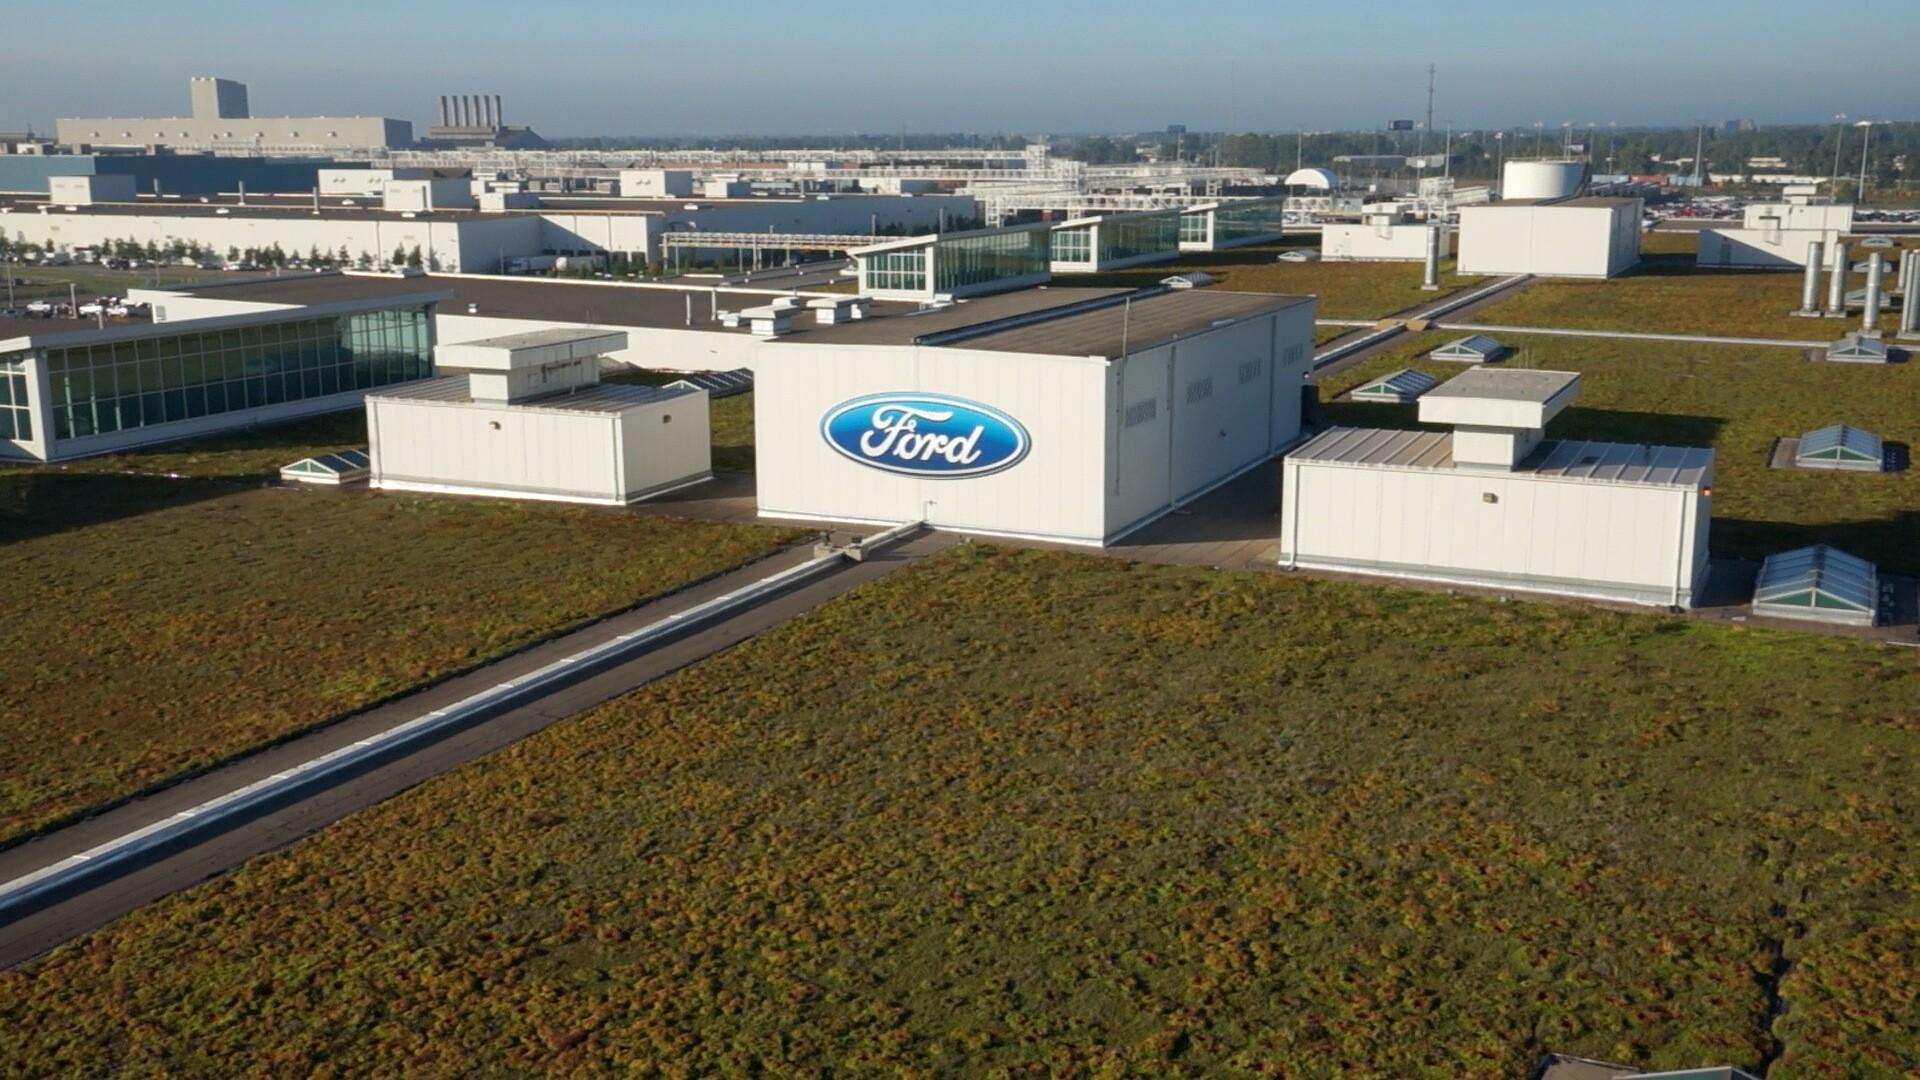 ford-invertirá-11-millones-de-dolares-para-construir-tres-fabricas-en-eua-alt.jpg